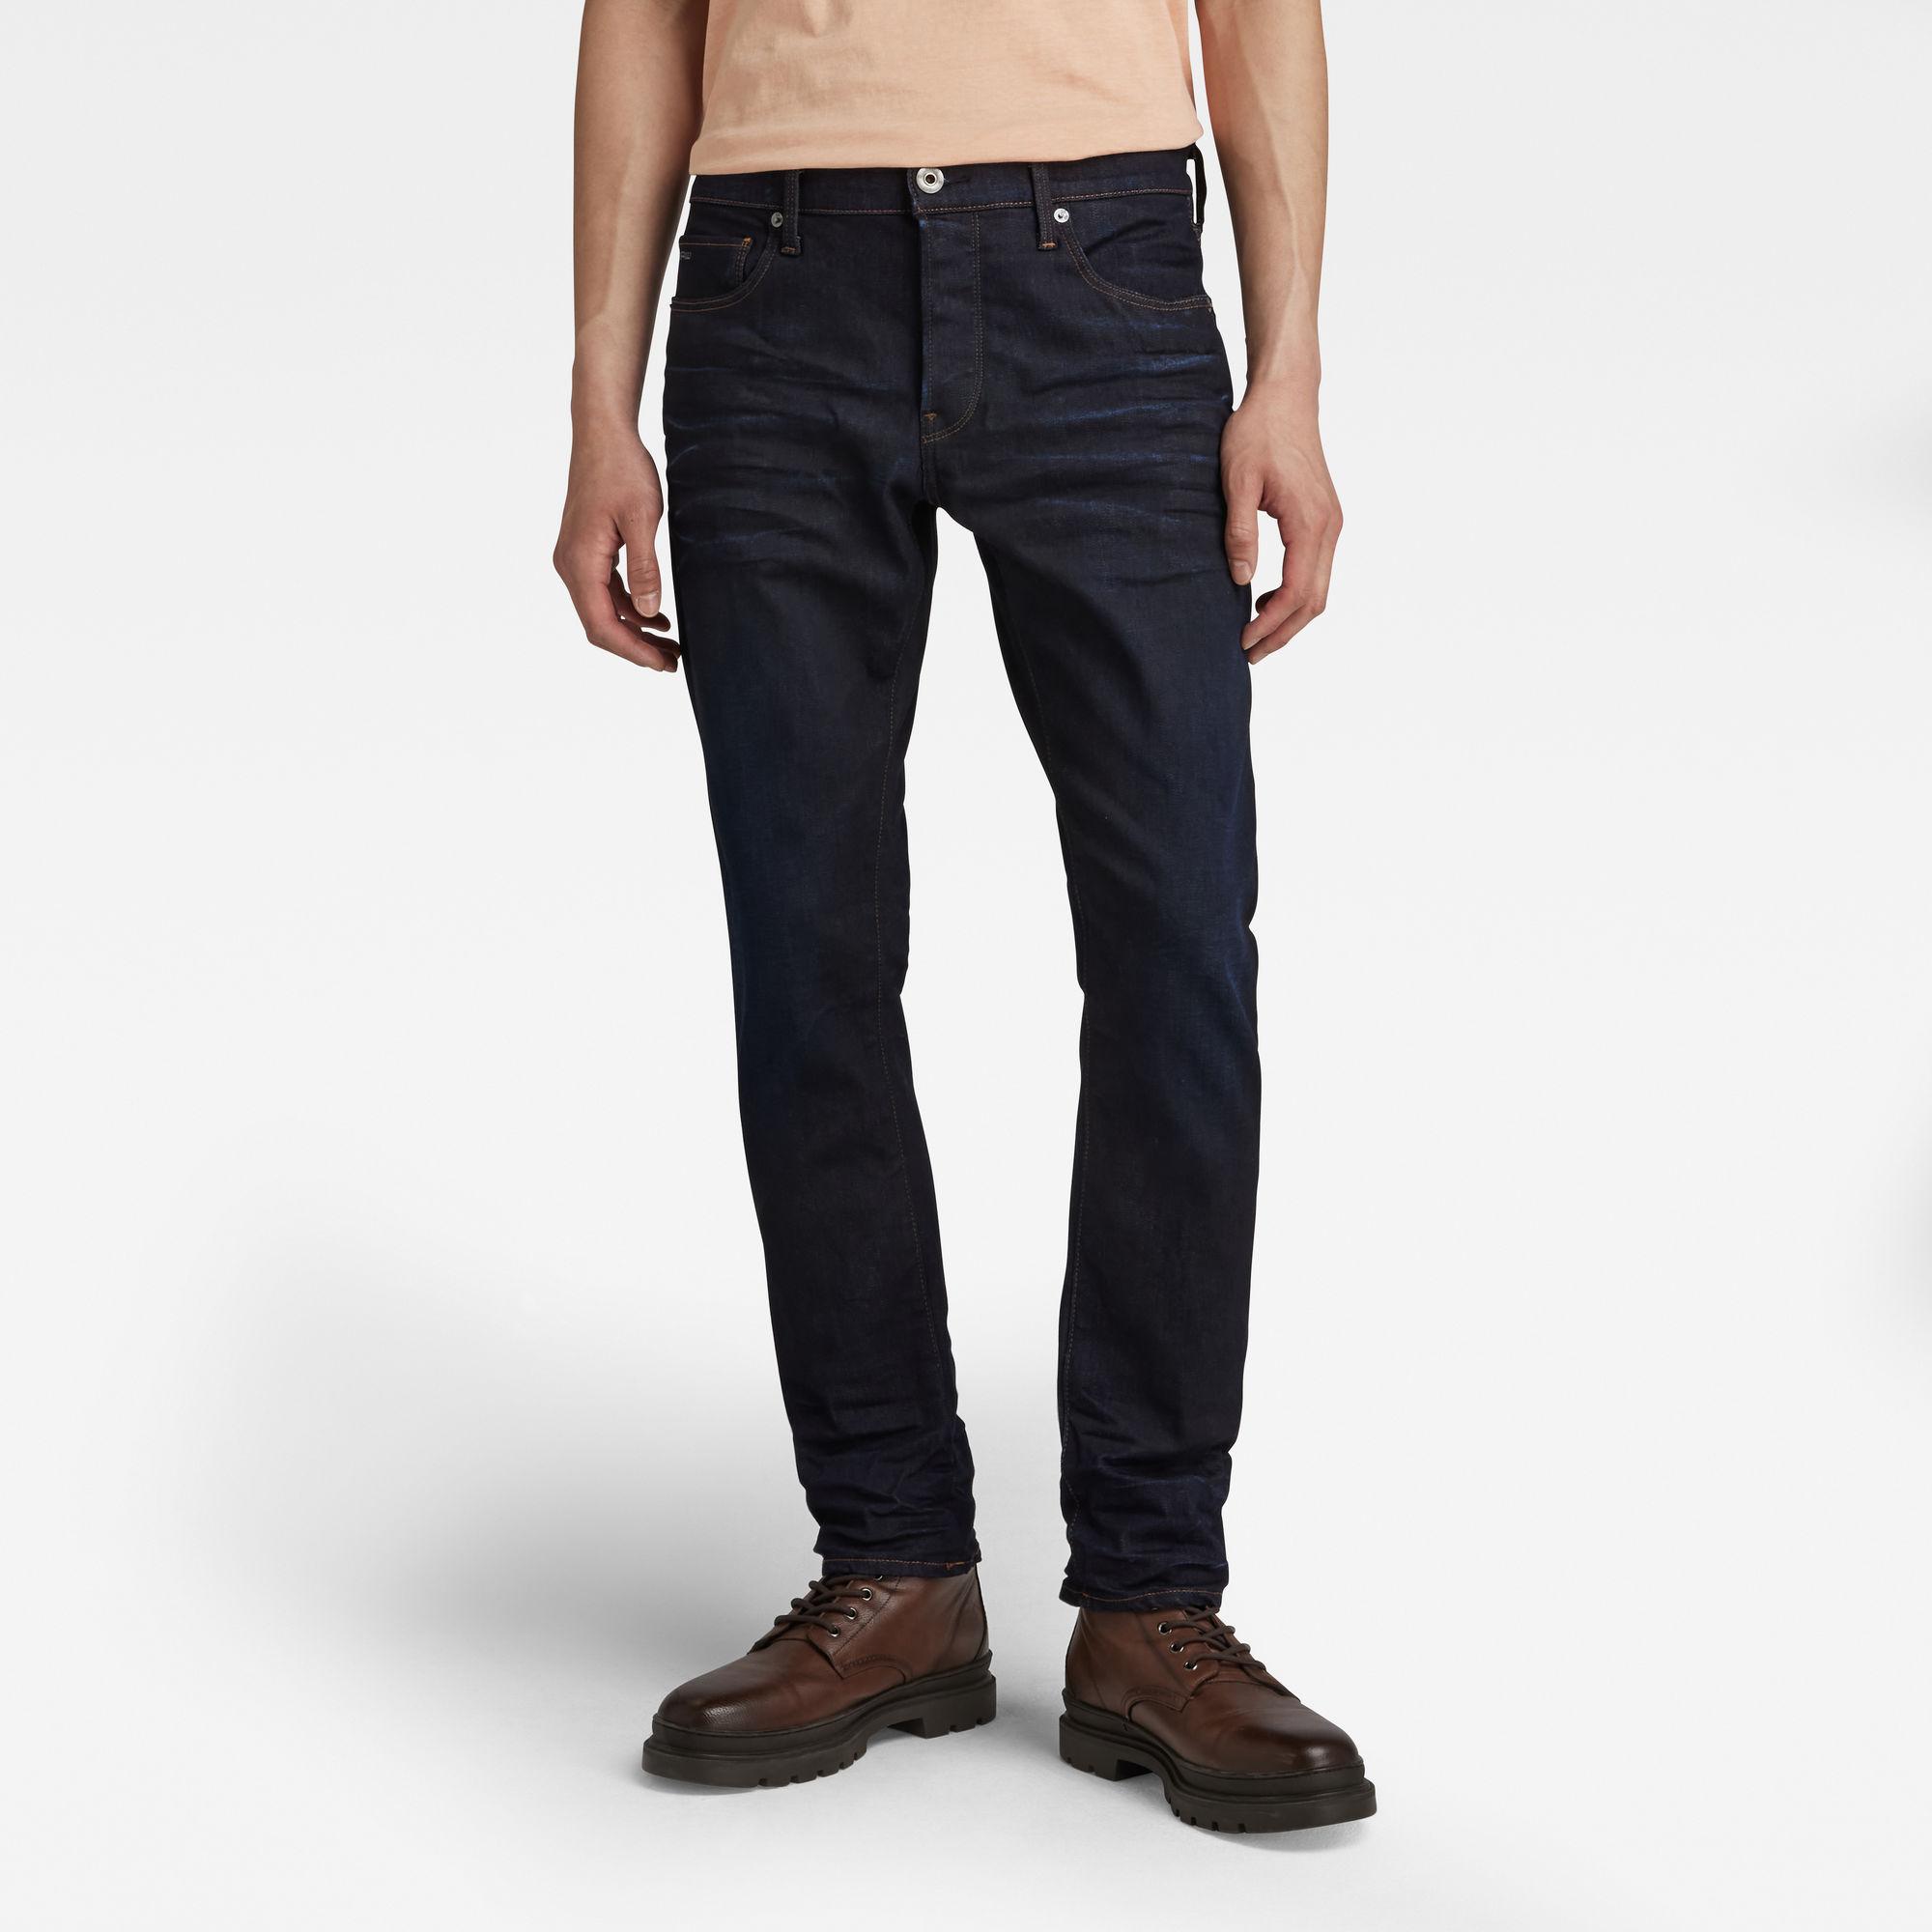 G-Star RAW Heren 3301 Straight Tapered Jeans Donkerblauw